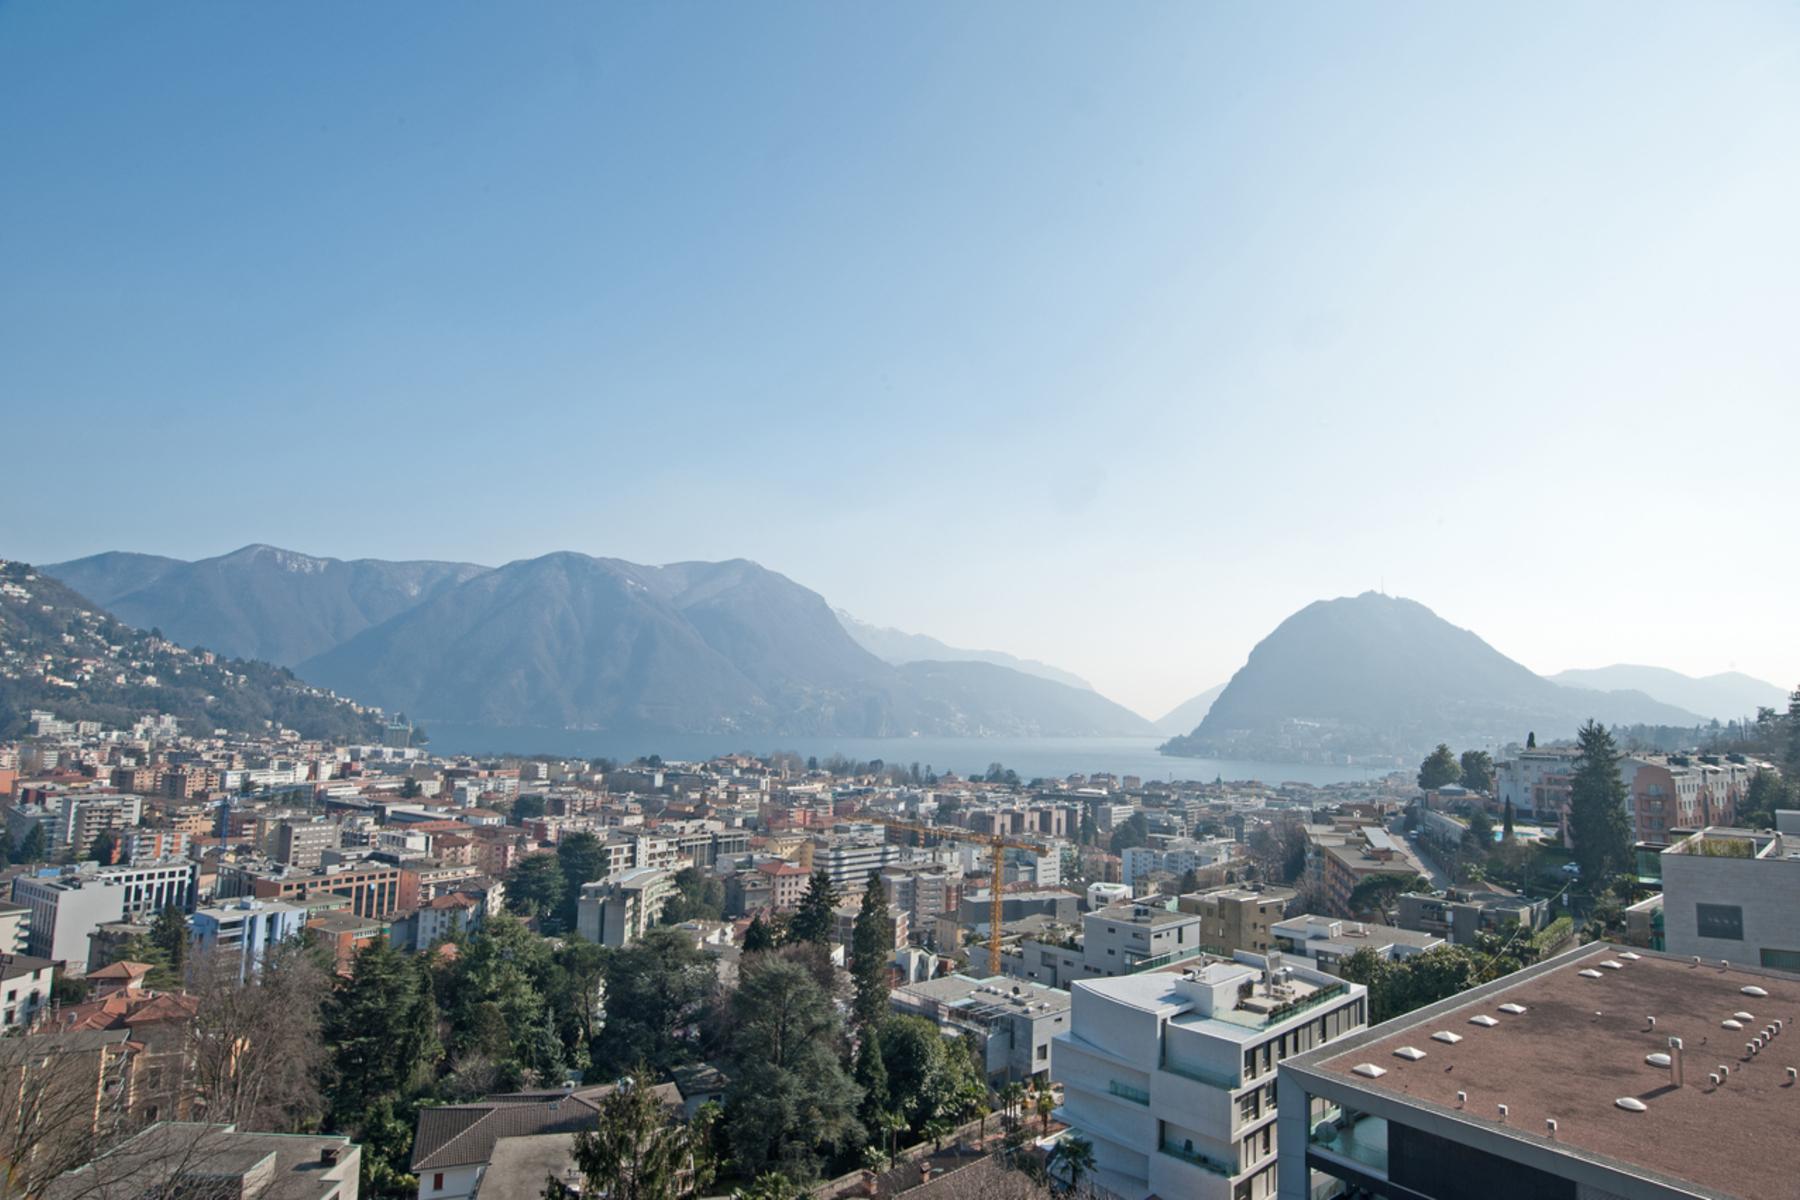 Apartamento para Venda às Elegant penthouse with a beautiful lake view Lugano, Lugano, Ticino, 6900 Suíça